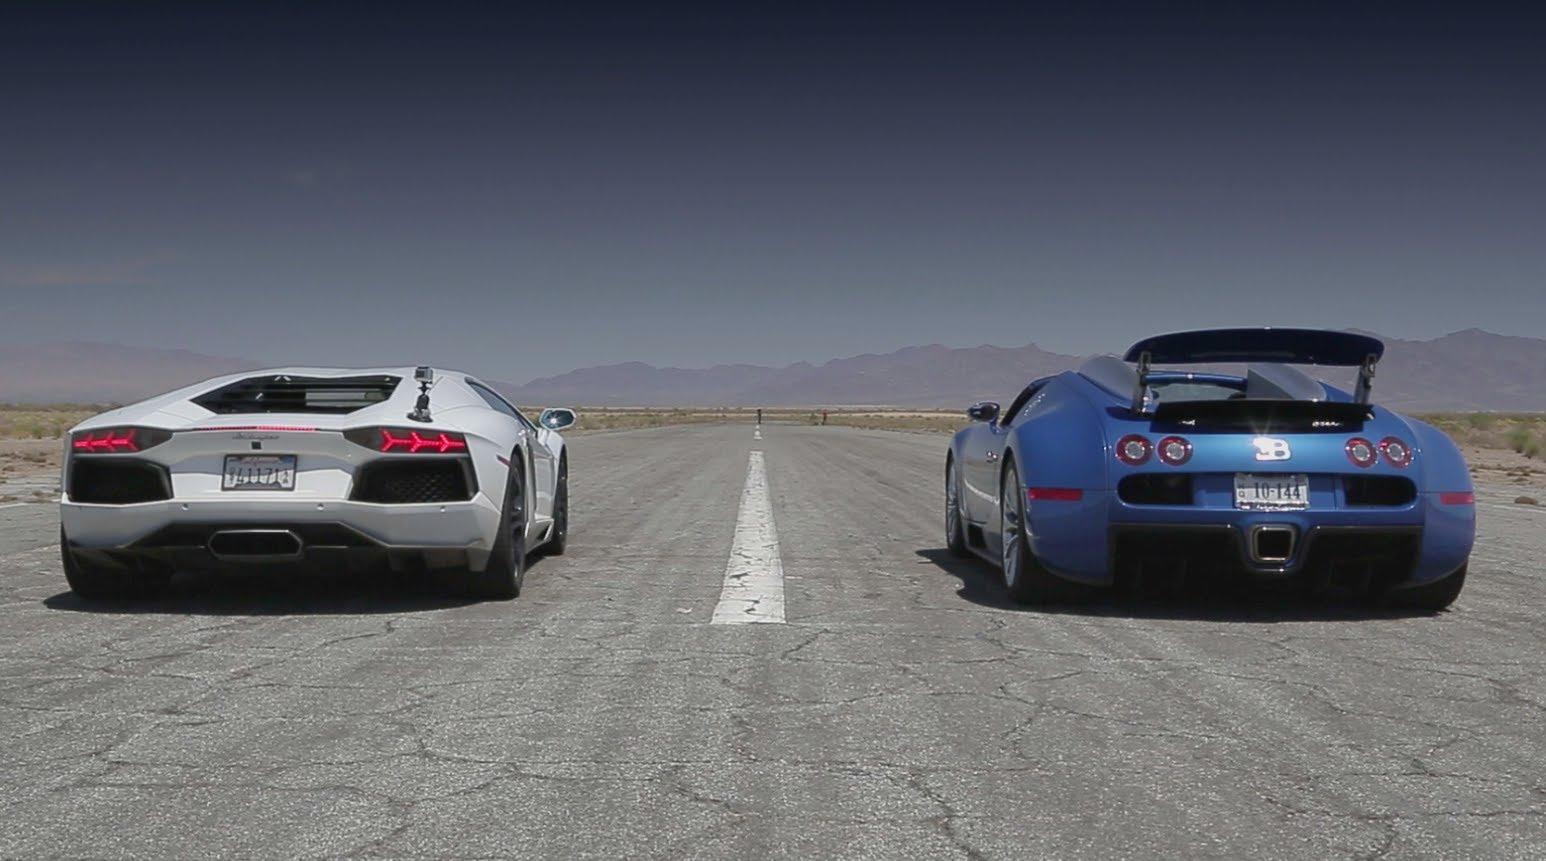 Aventedor Vs Veyron